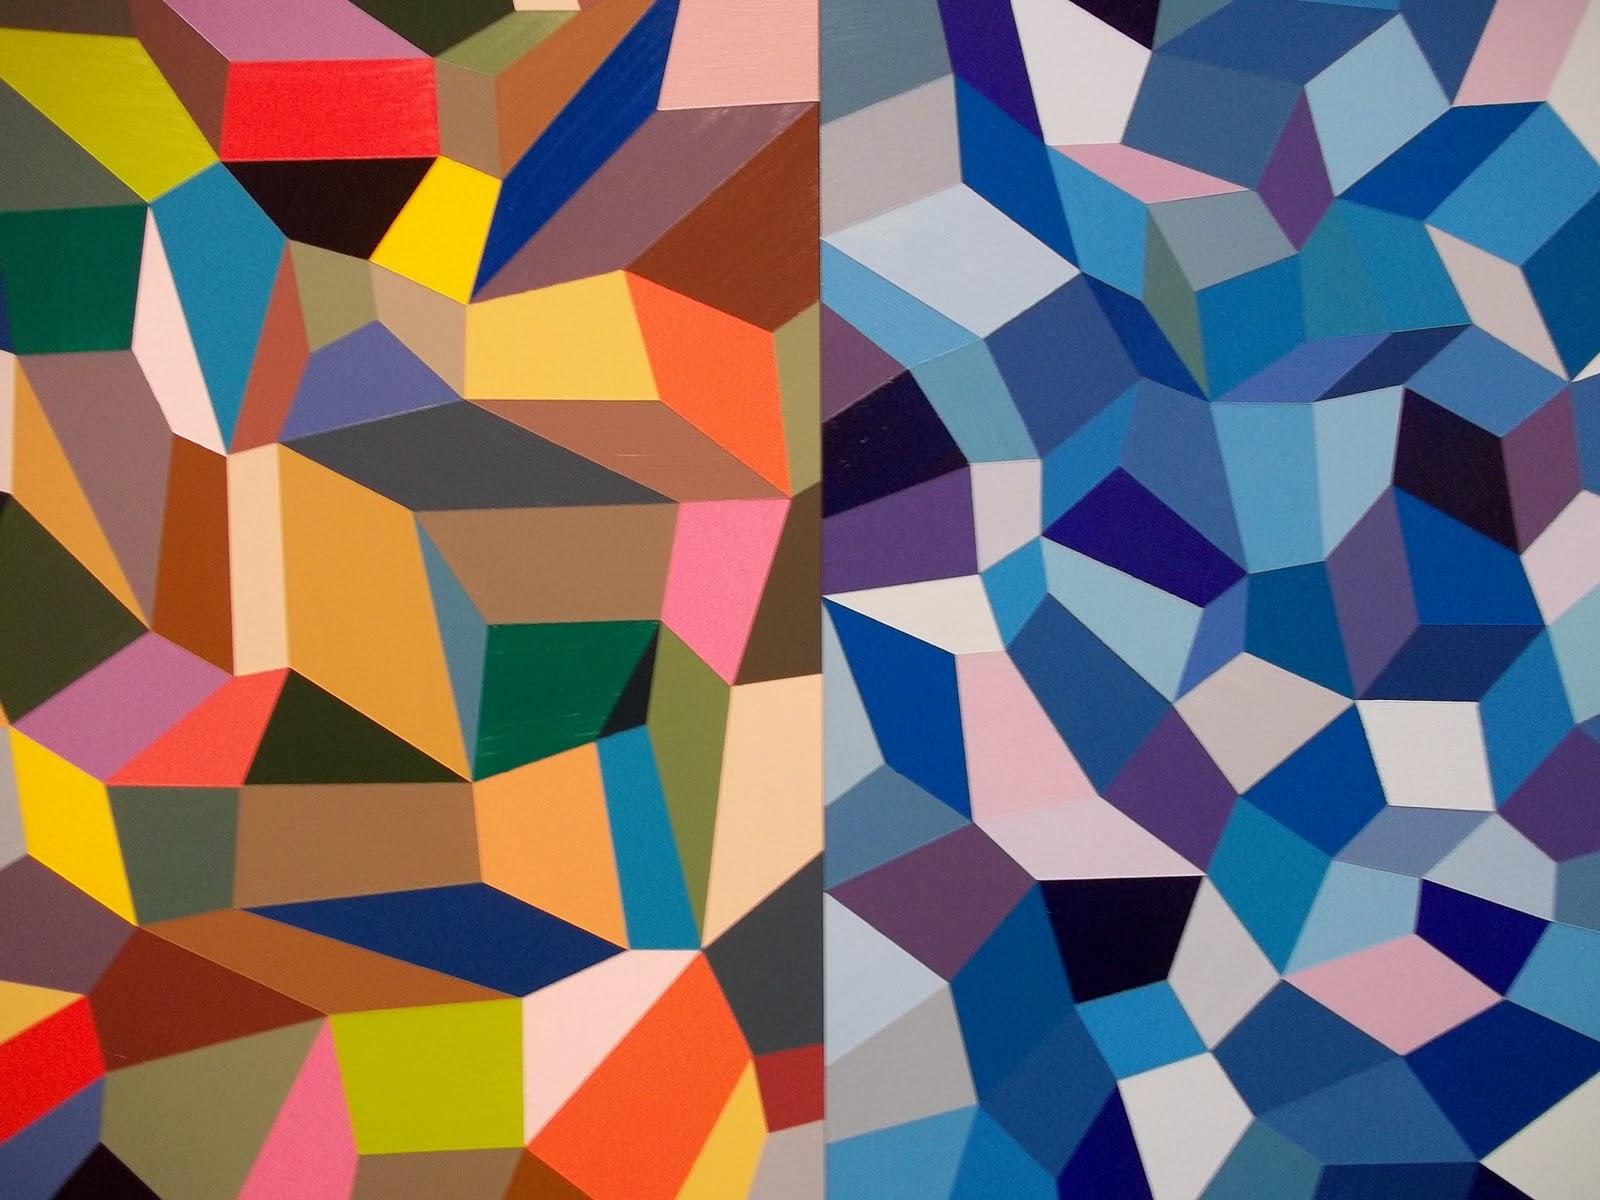 geometric shapes paintings